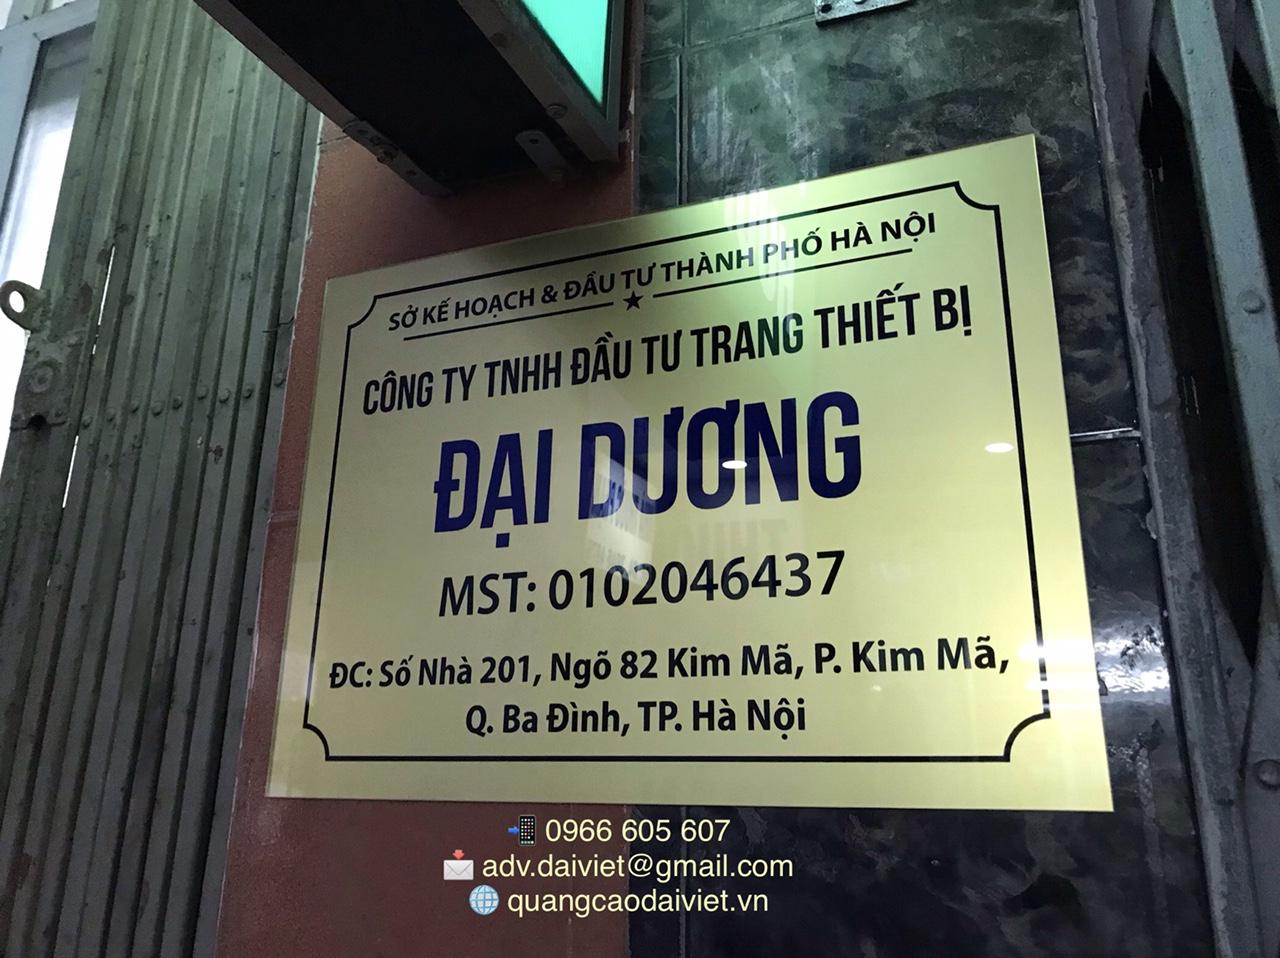 bien-mica-son-nhu-dong